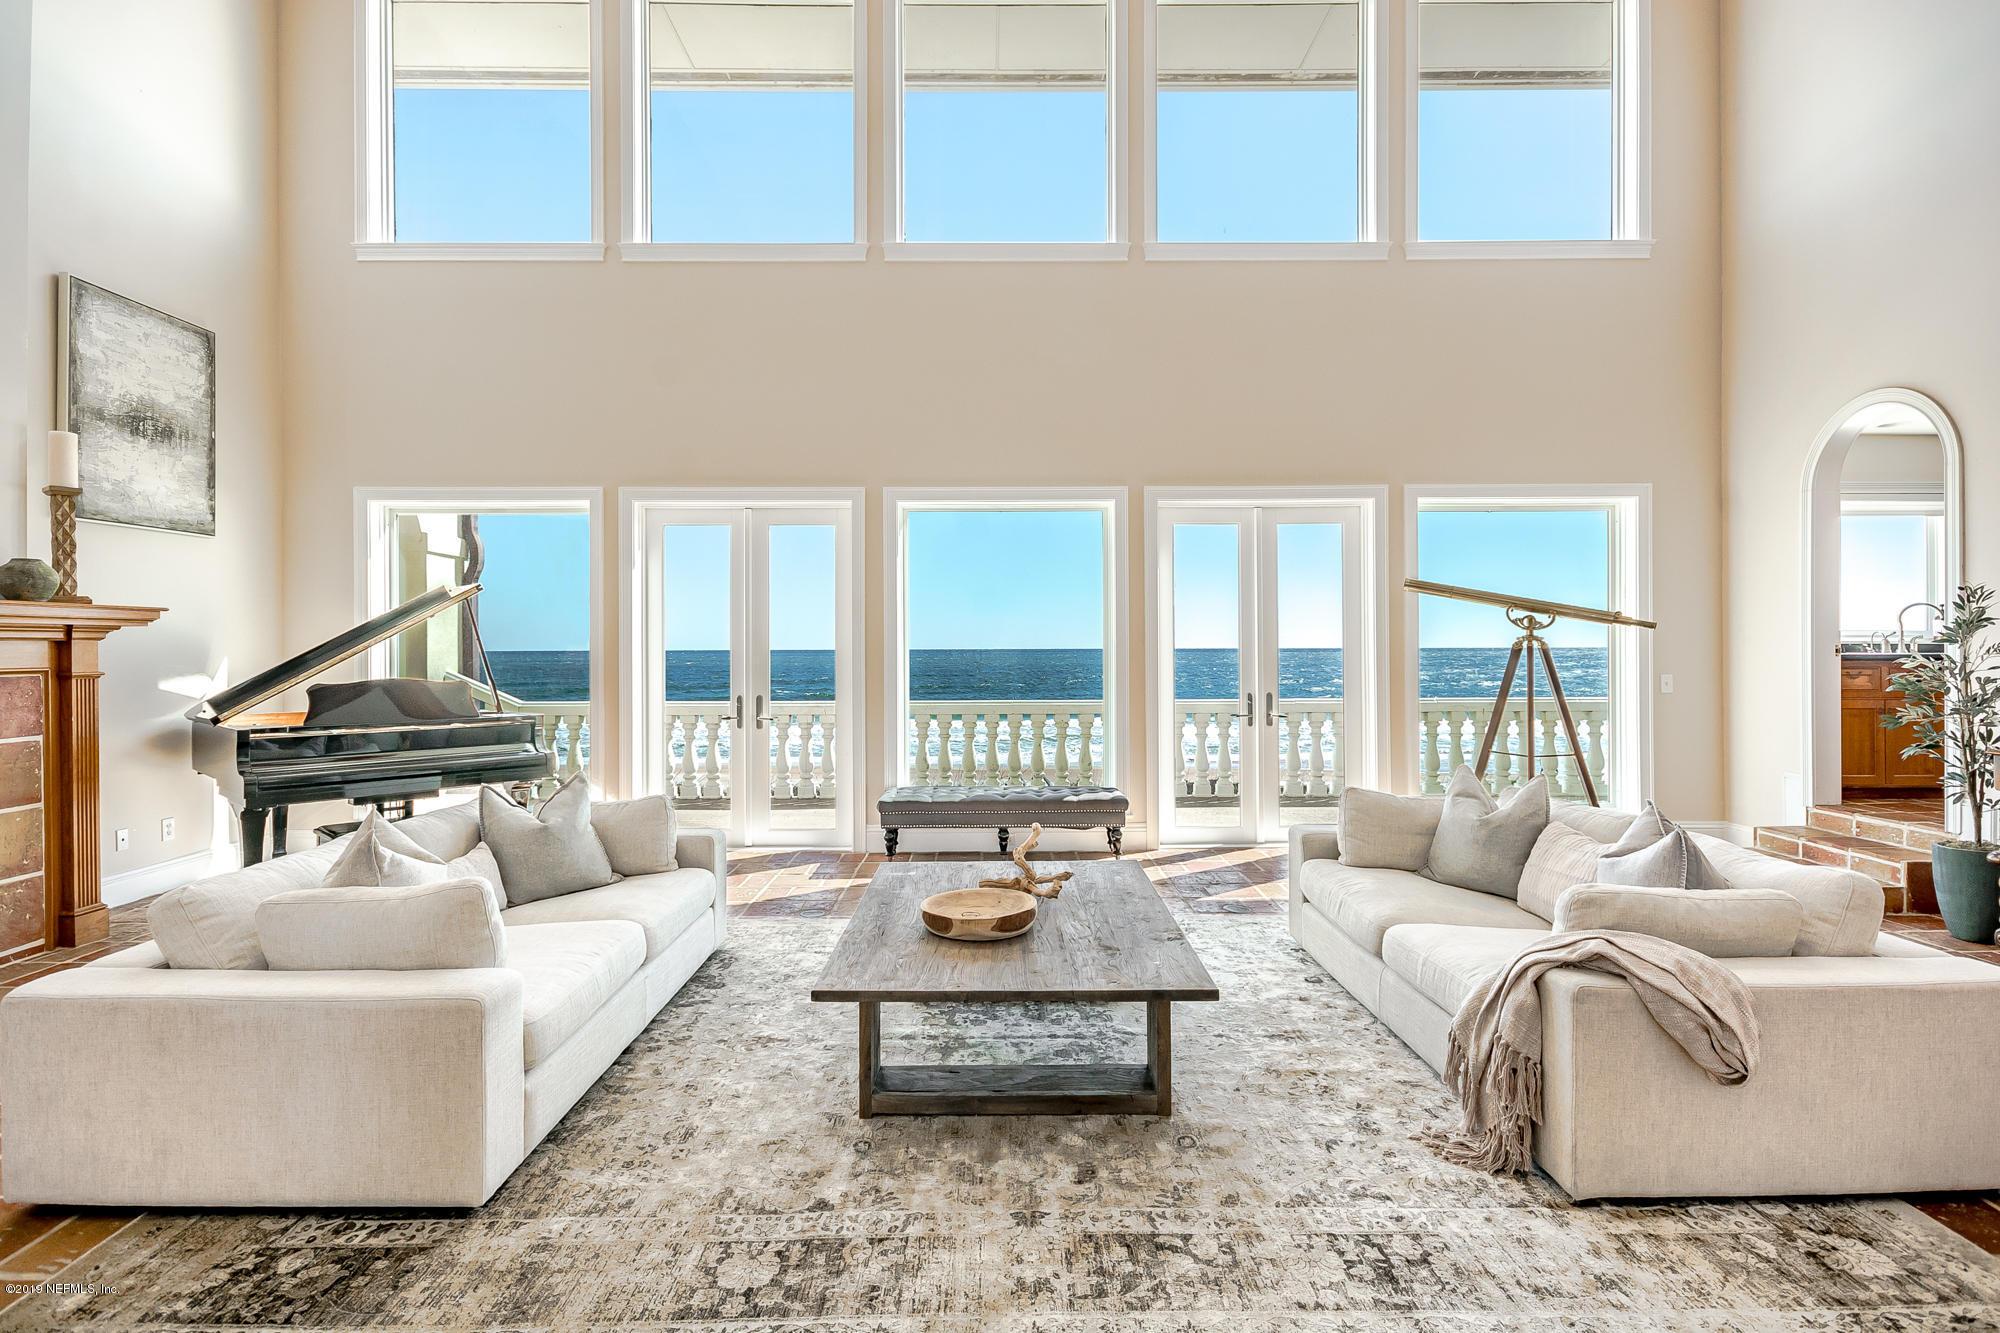 1109 Ponte Vedra, PONTE VEDRA BEACH, FLORIDA 32082, 5 Bedrooms Bedrooms, ,4 BathroomsBathrooms,Residential - single family,For sale,Ponte Vedra,984539